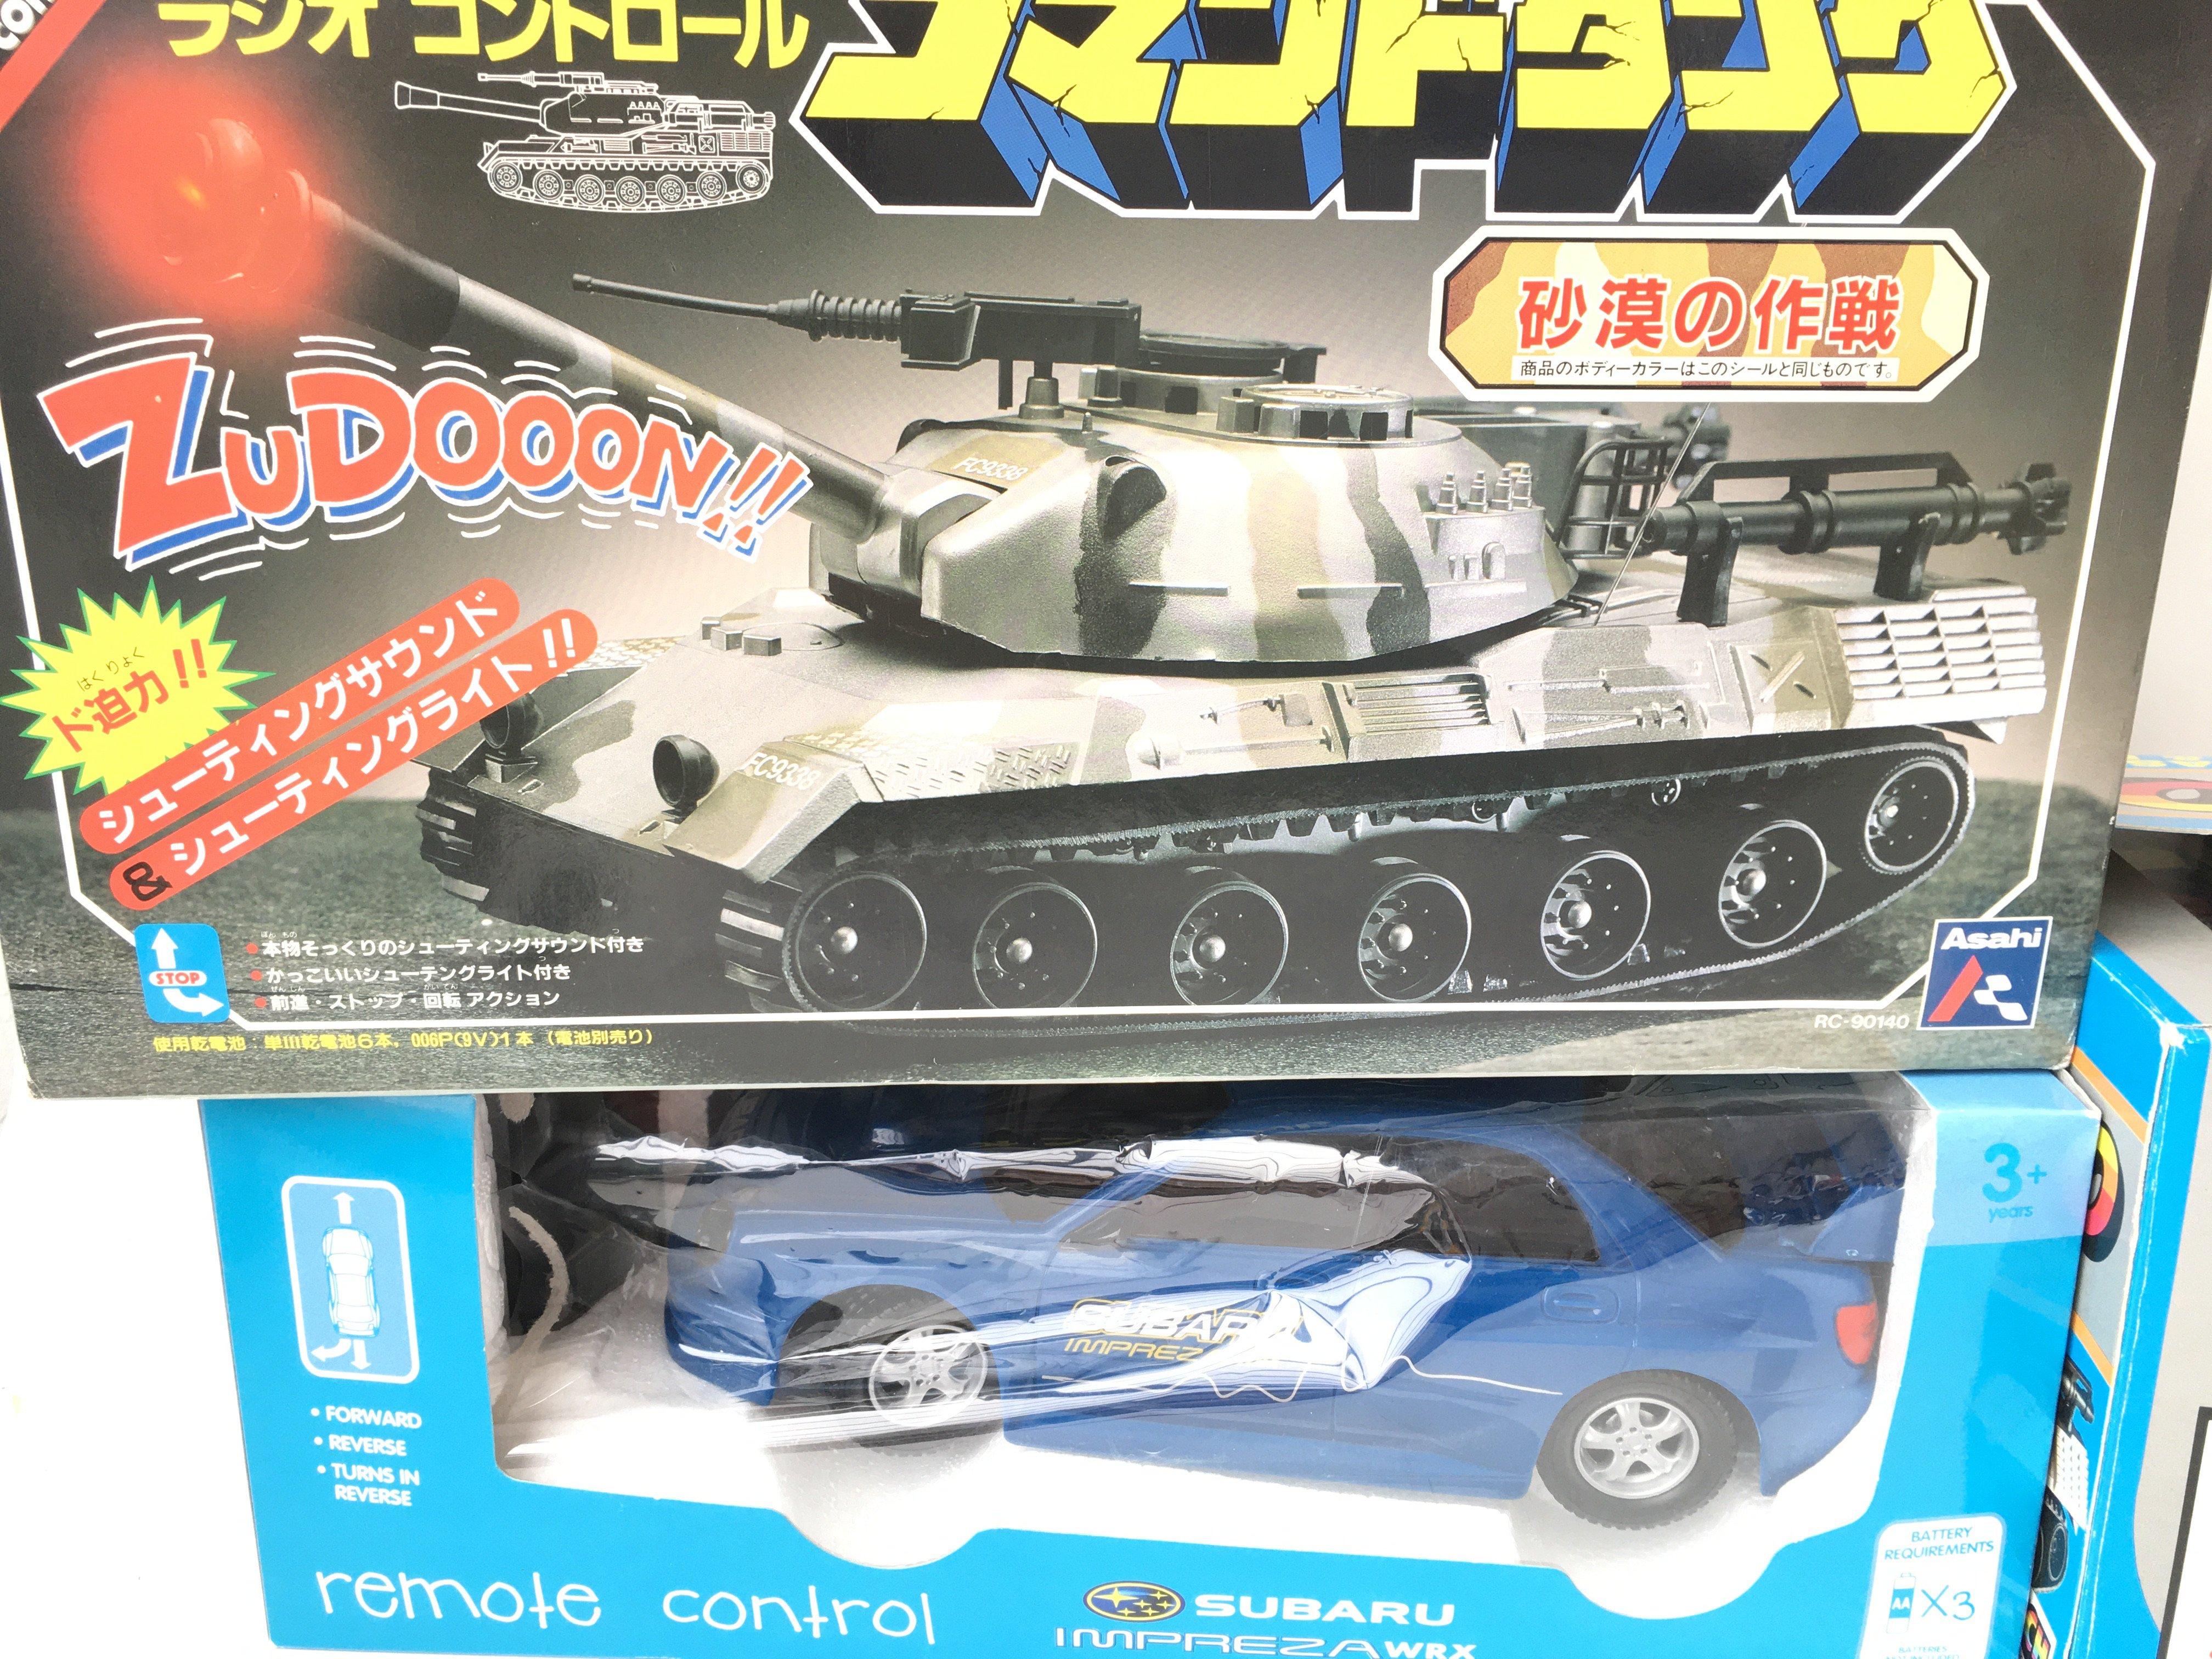 2 X Radio Controlled Command Tanks & A R/C Subaru - Image 2 of 3